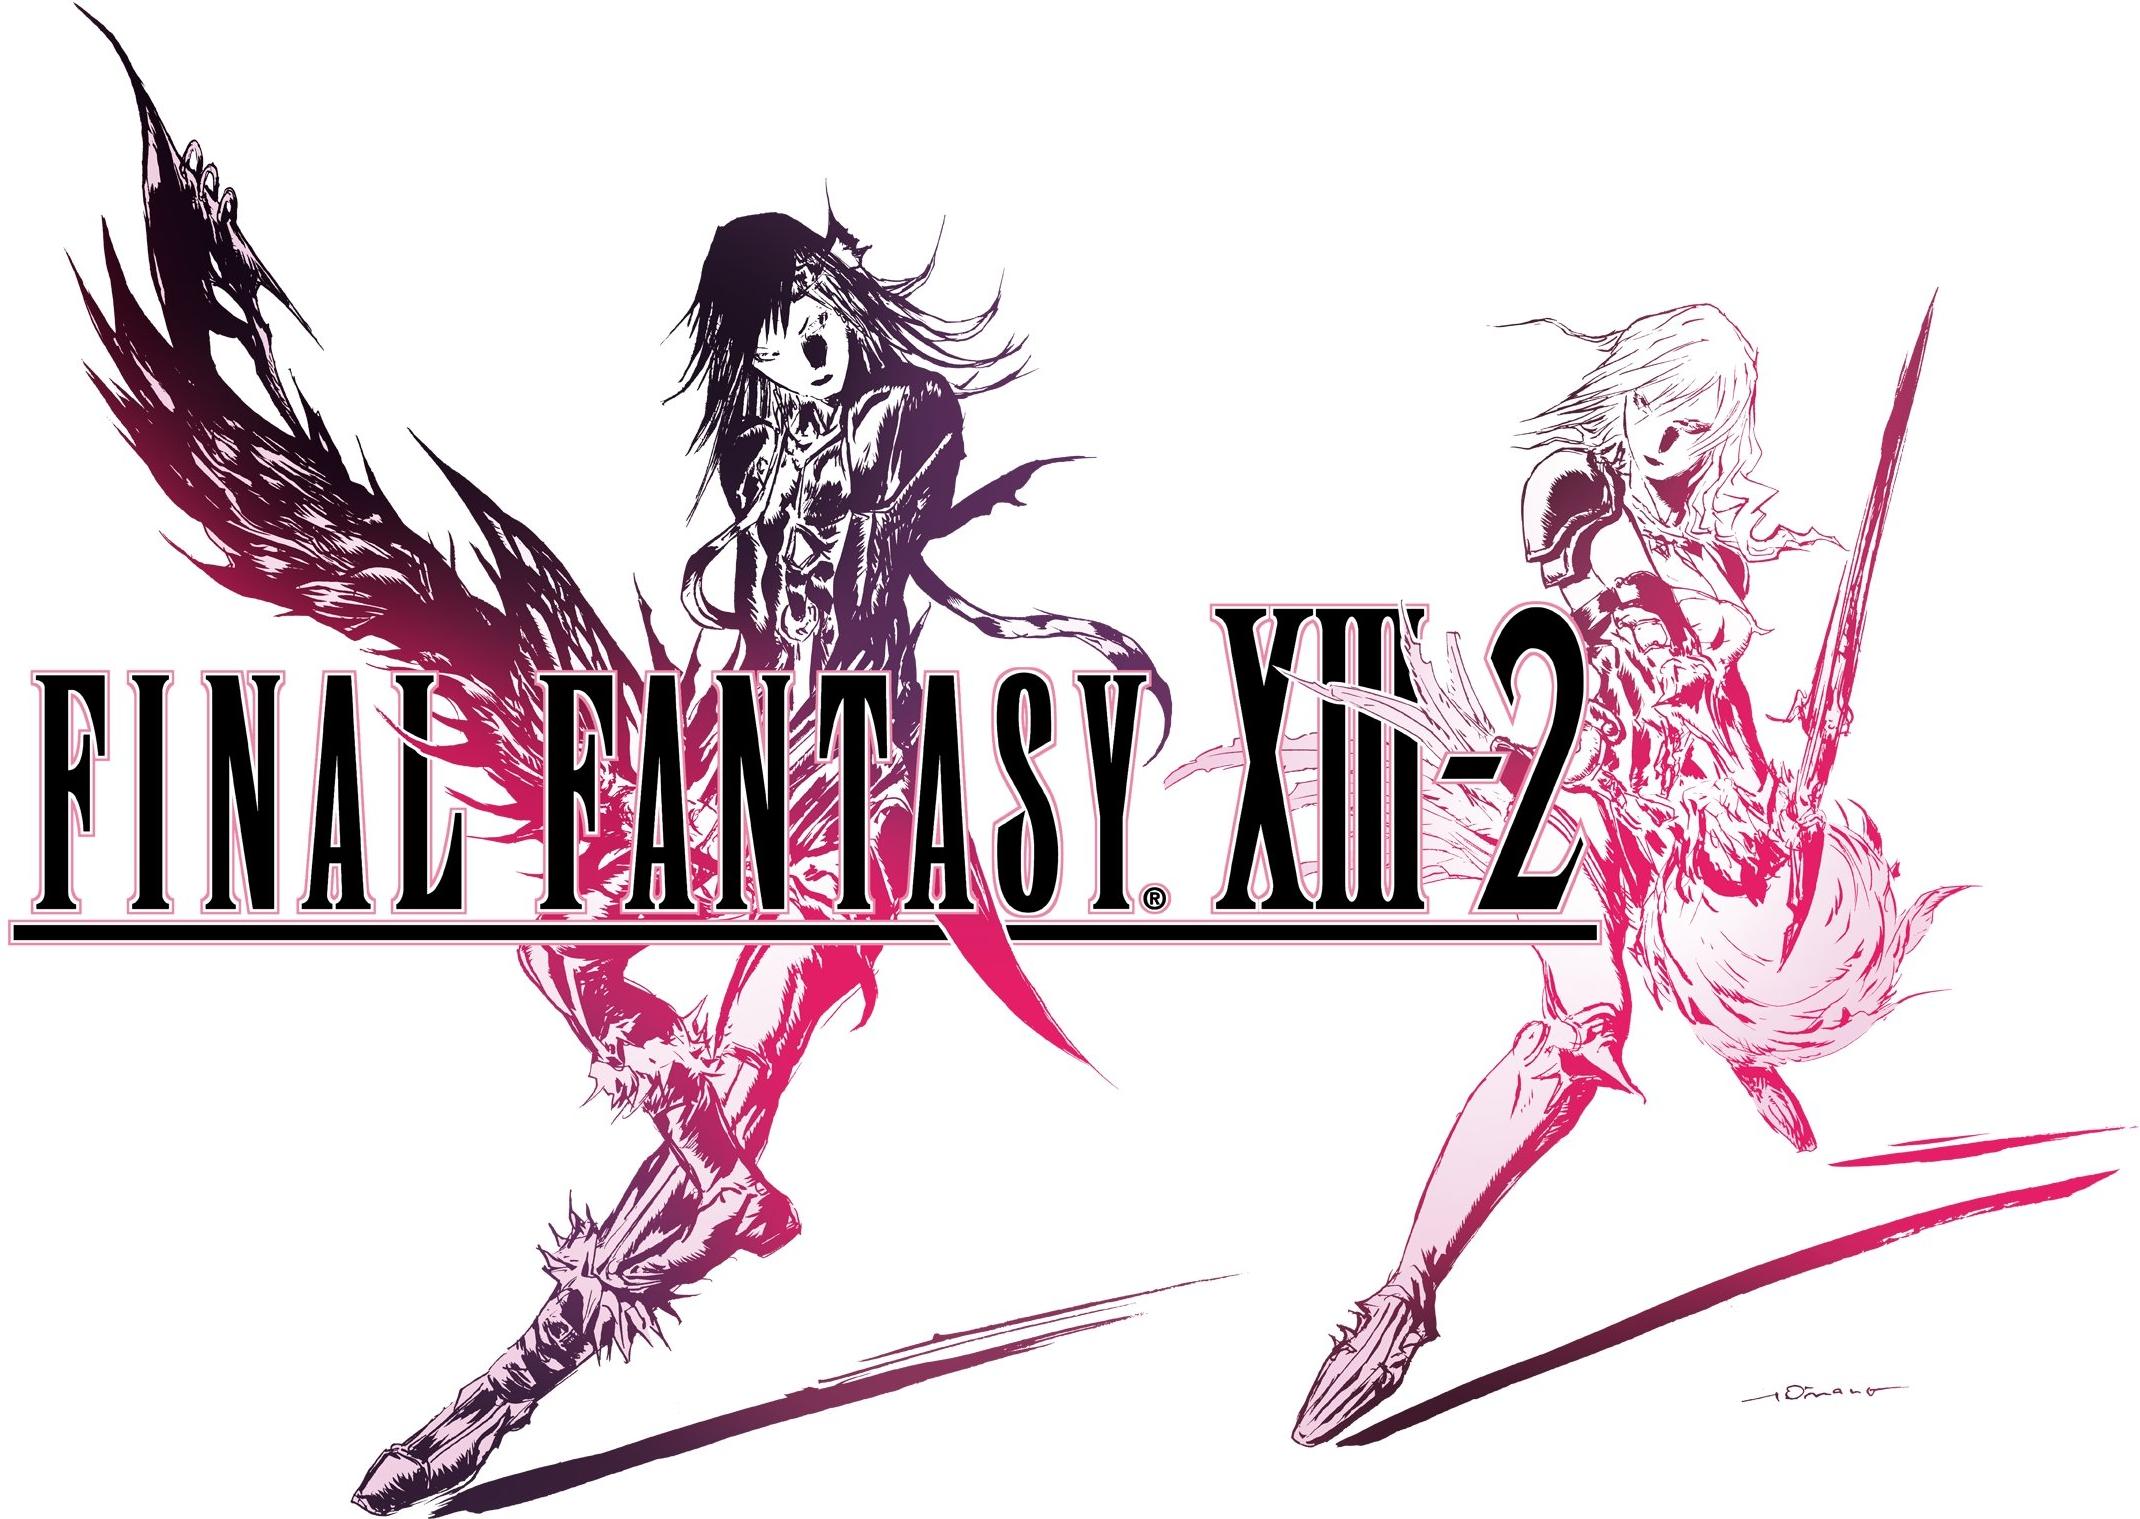 Final Fantasy Xiii 2 Final Fantasy Final Fantasy Xii Final Fantasy Xi